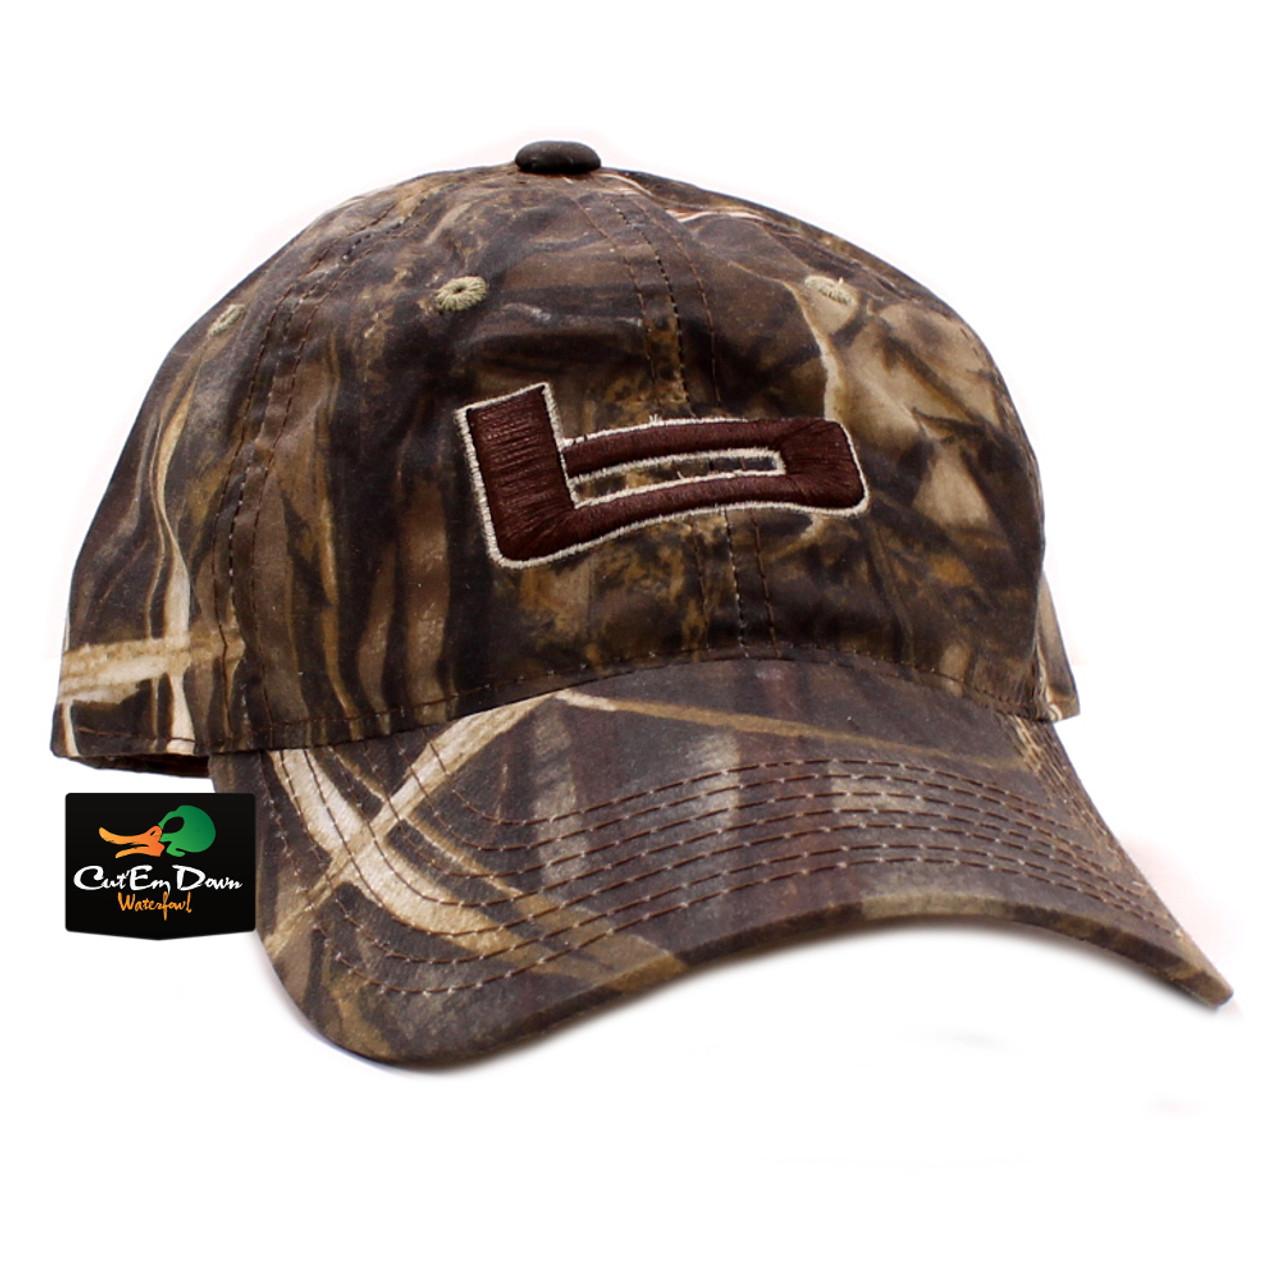 Banded Waxed Hunting Cap - Max-4 Camo ba36c6cc691d